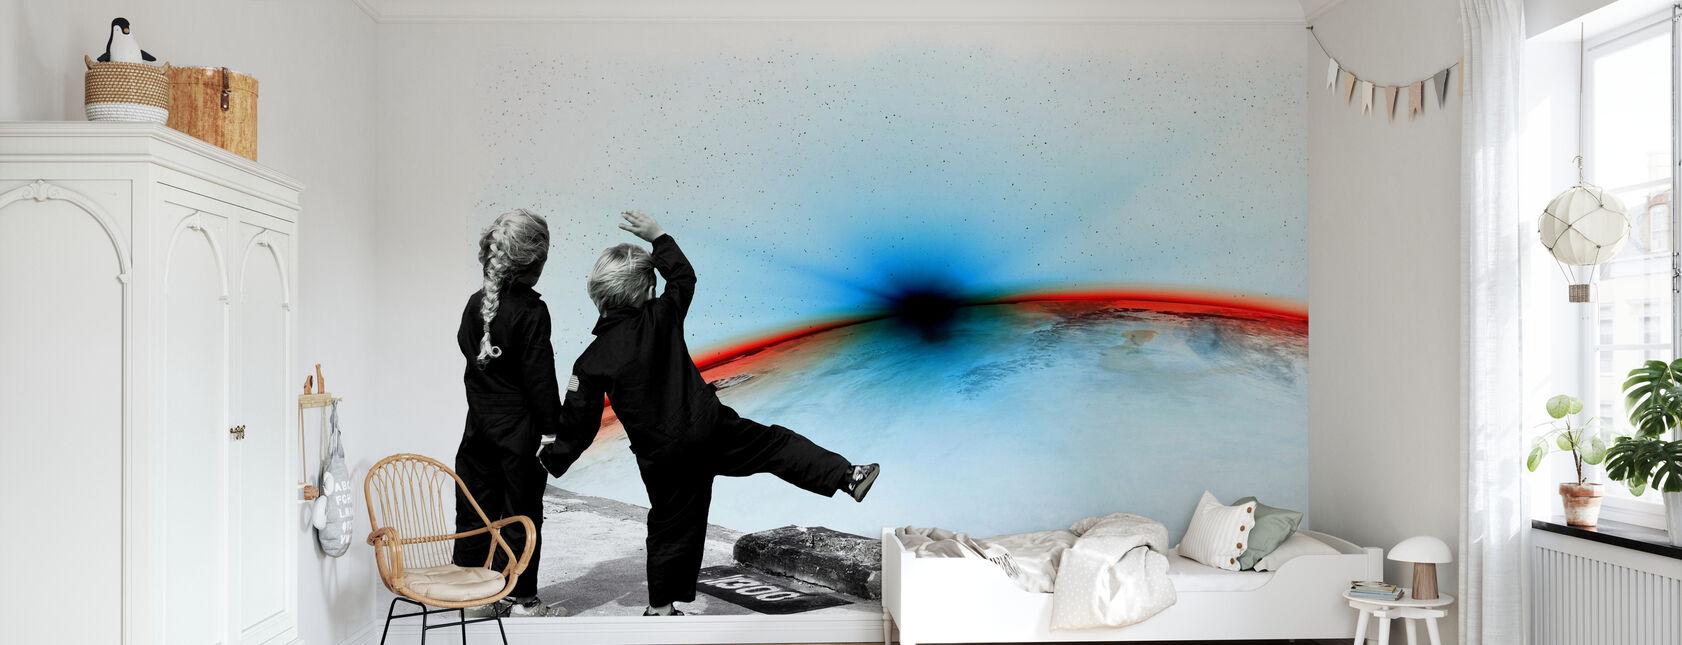 Adios - Wallpaper - Kids Room